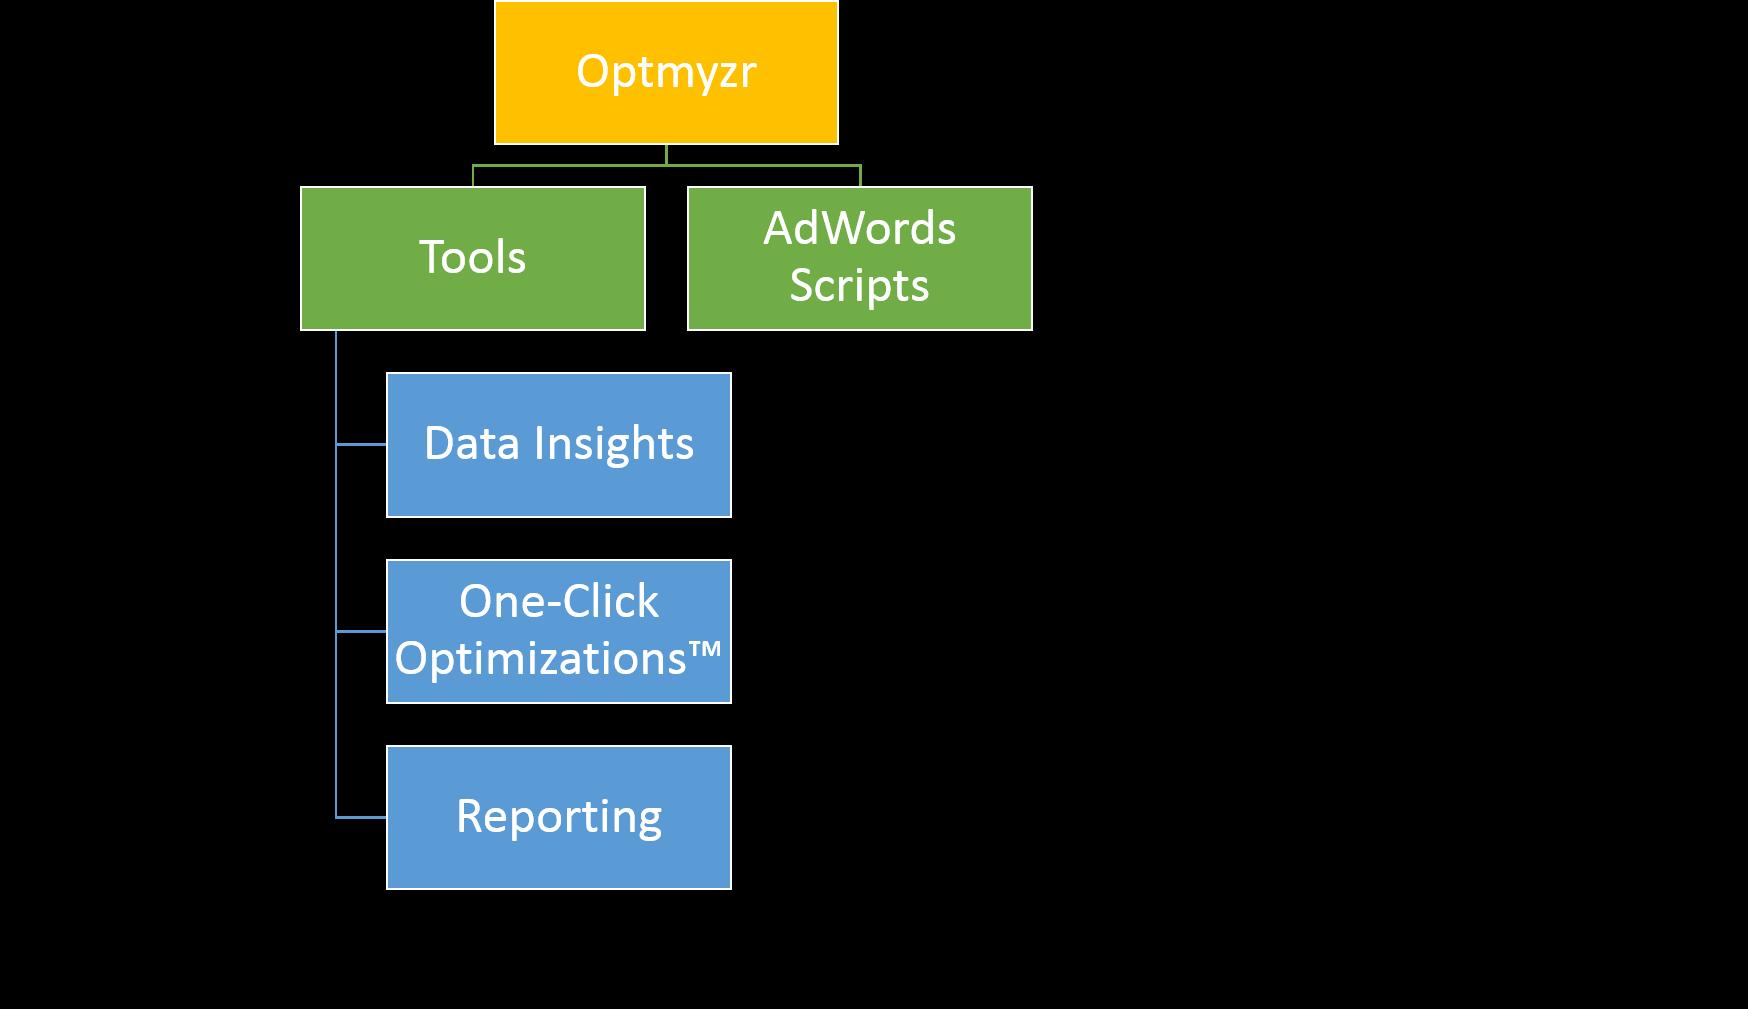 Optmyzr Tools & Scripts